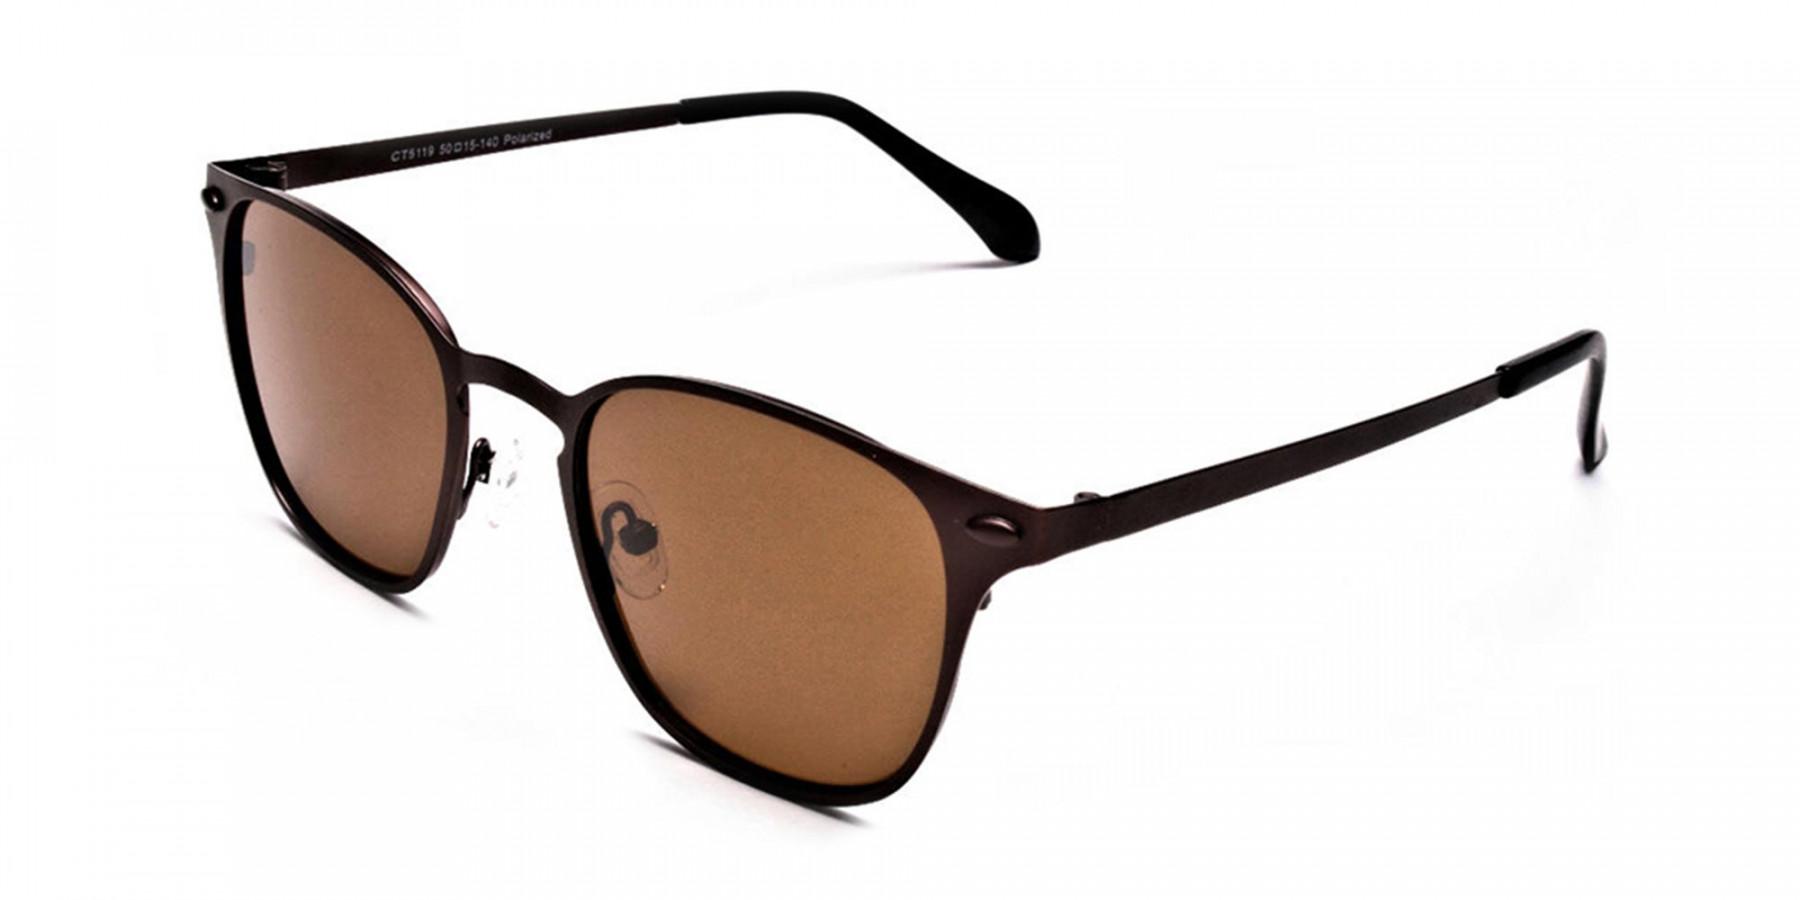 Brown Round Sunglasses - 2